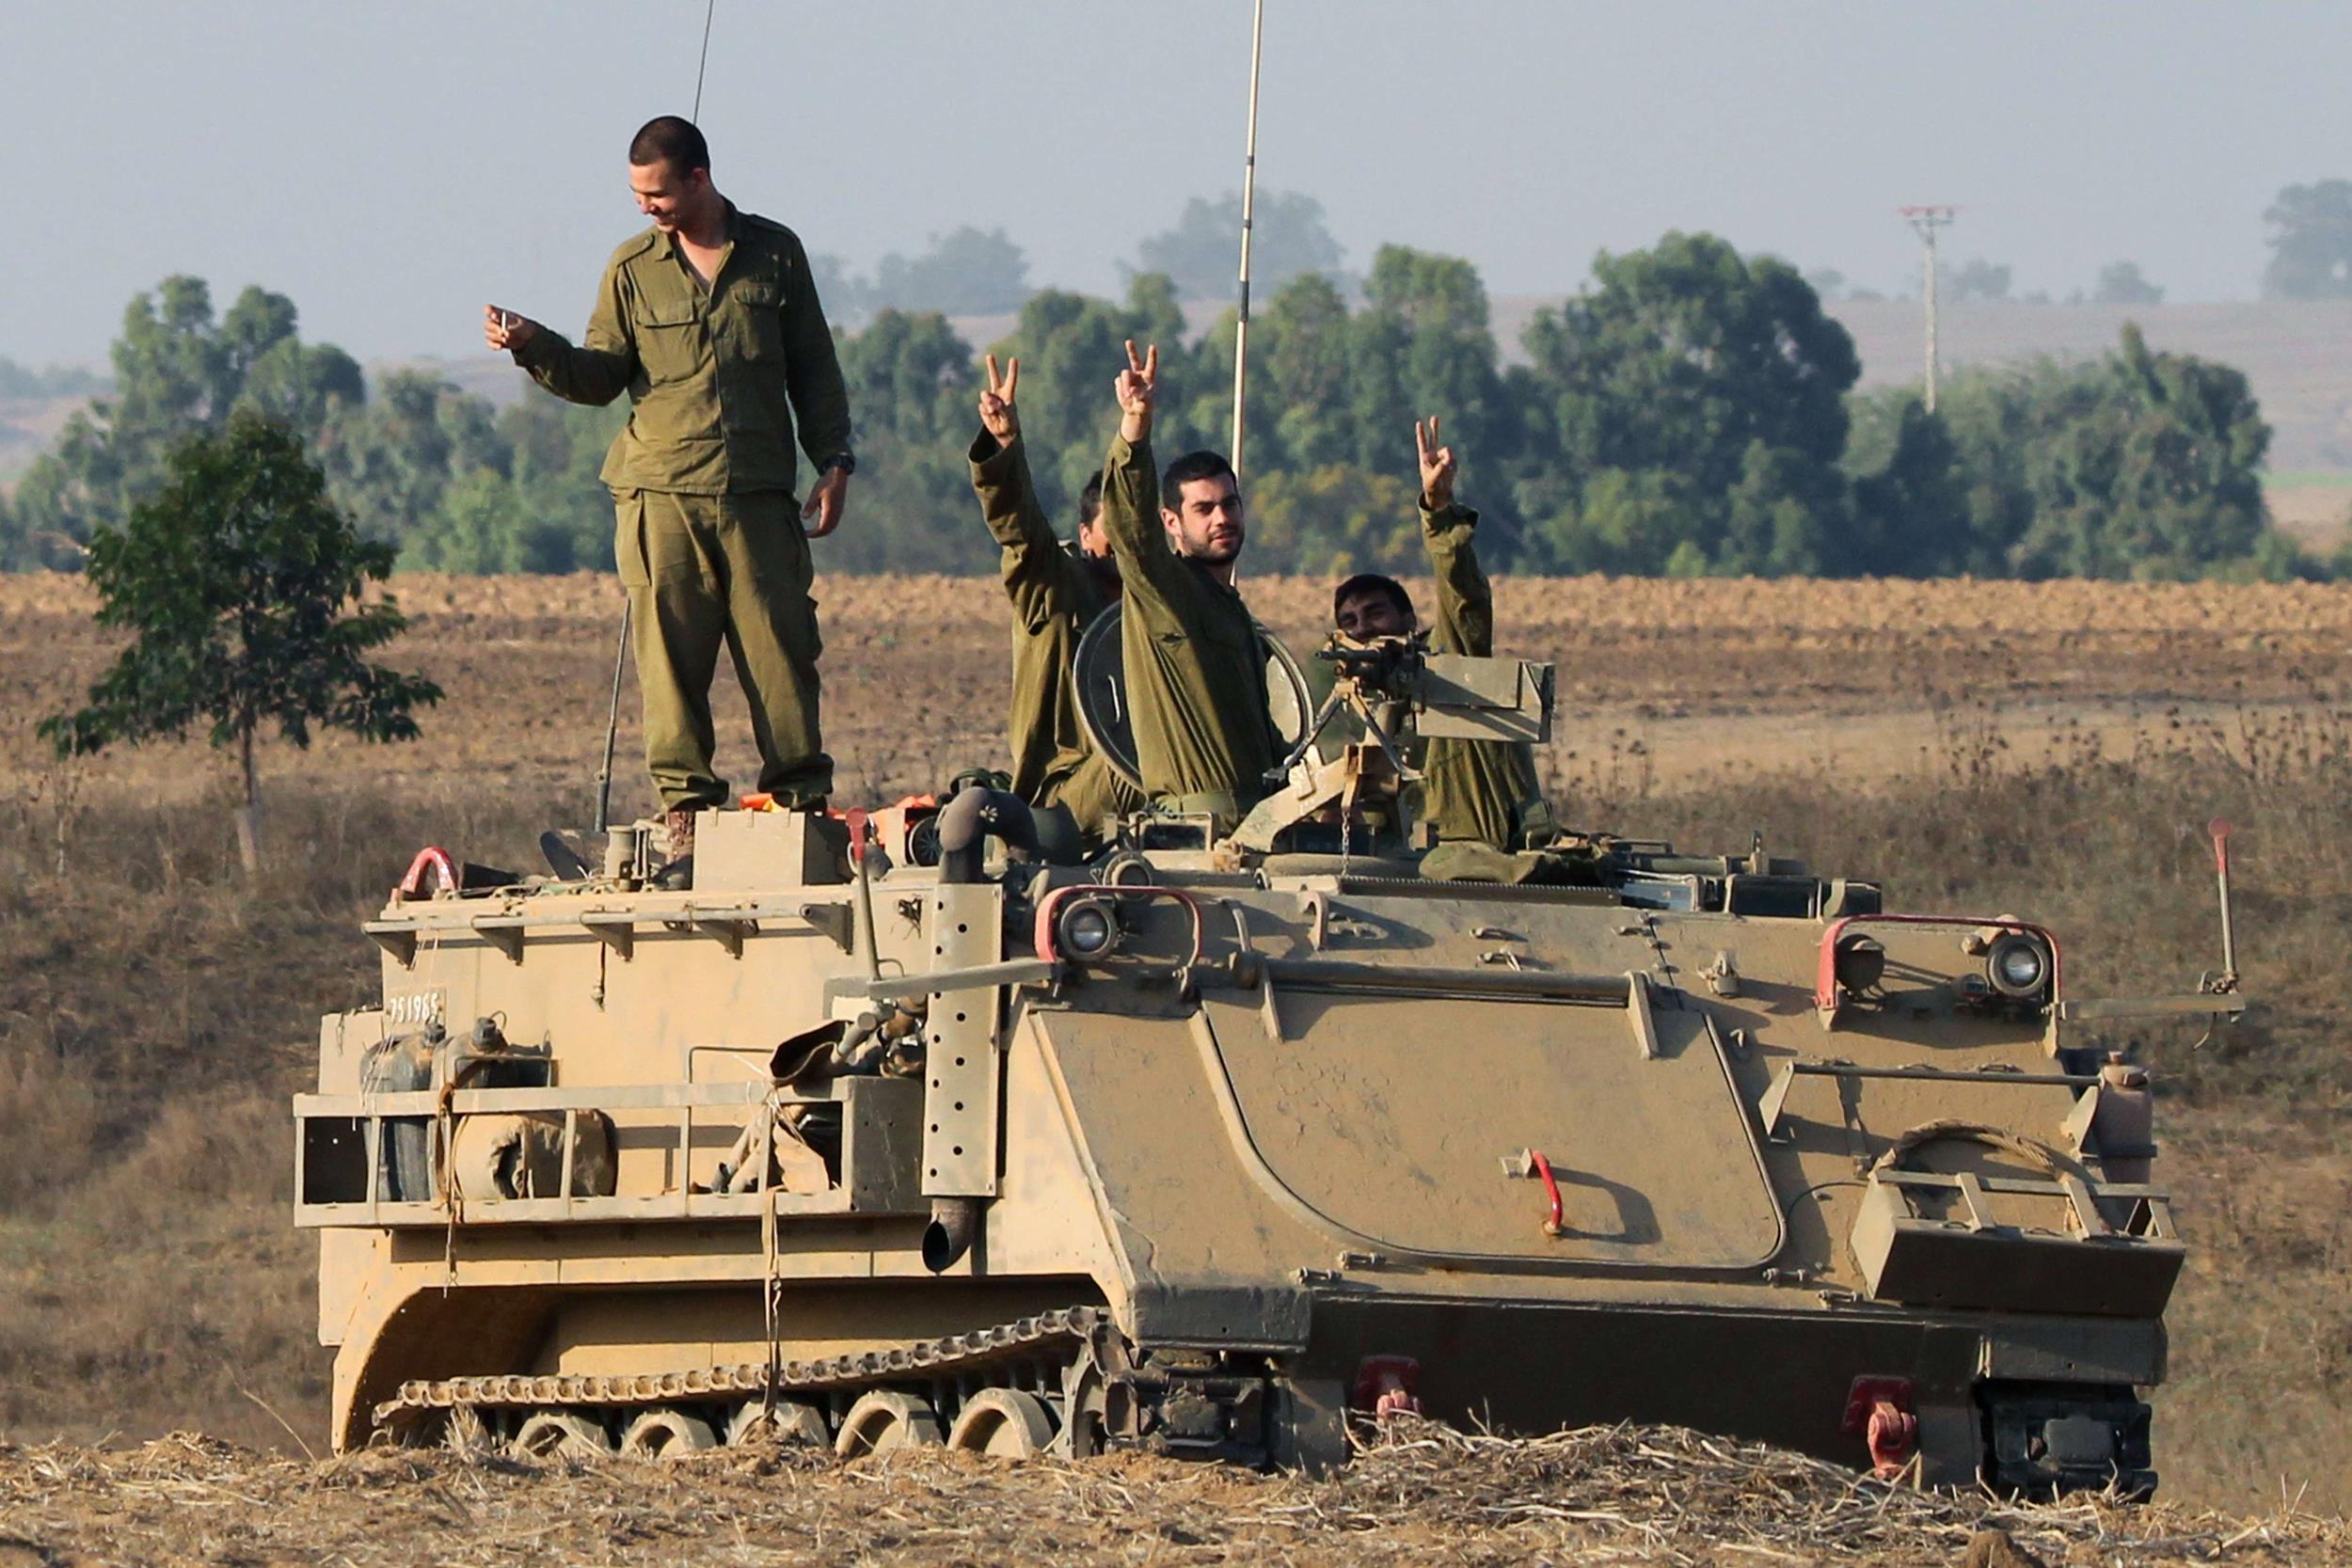 140715-israel-truce-cover-4a_b5ad421147ef302d93826ac4cbb47a19